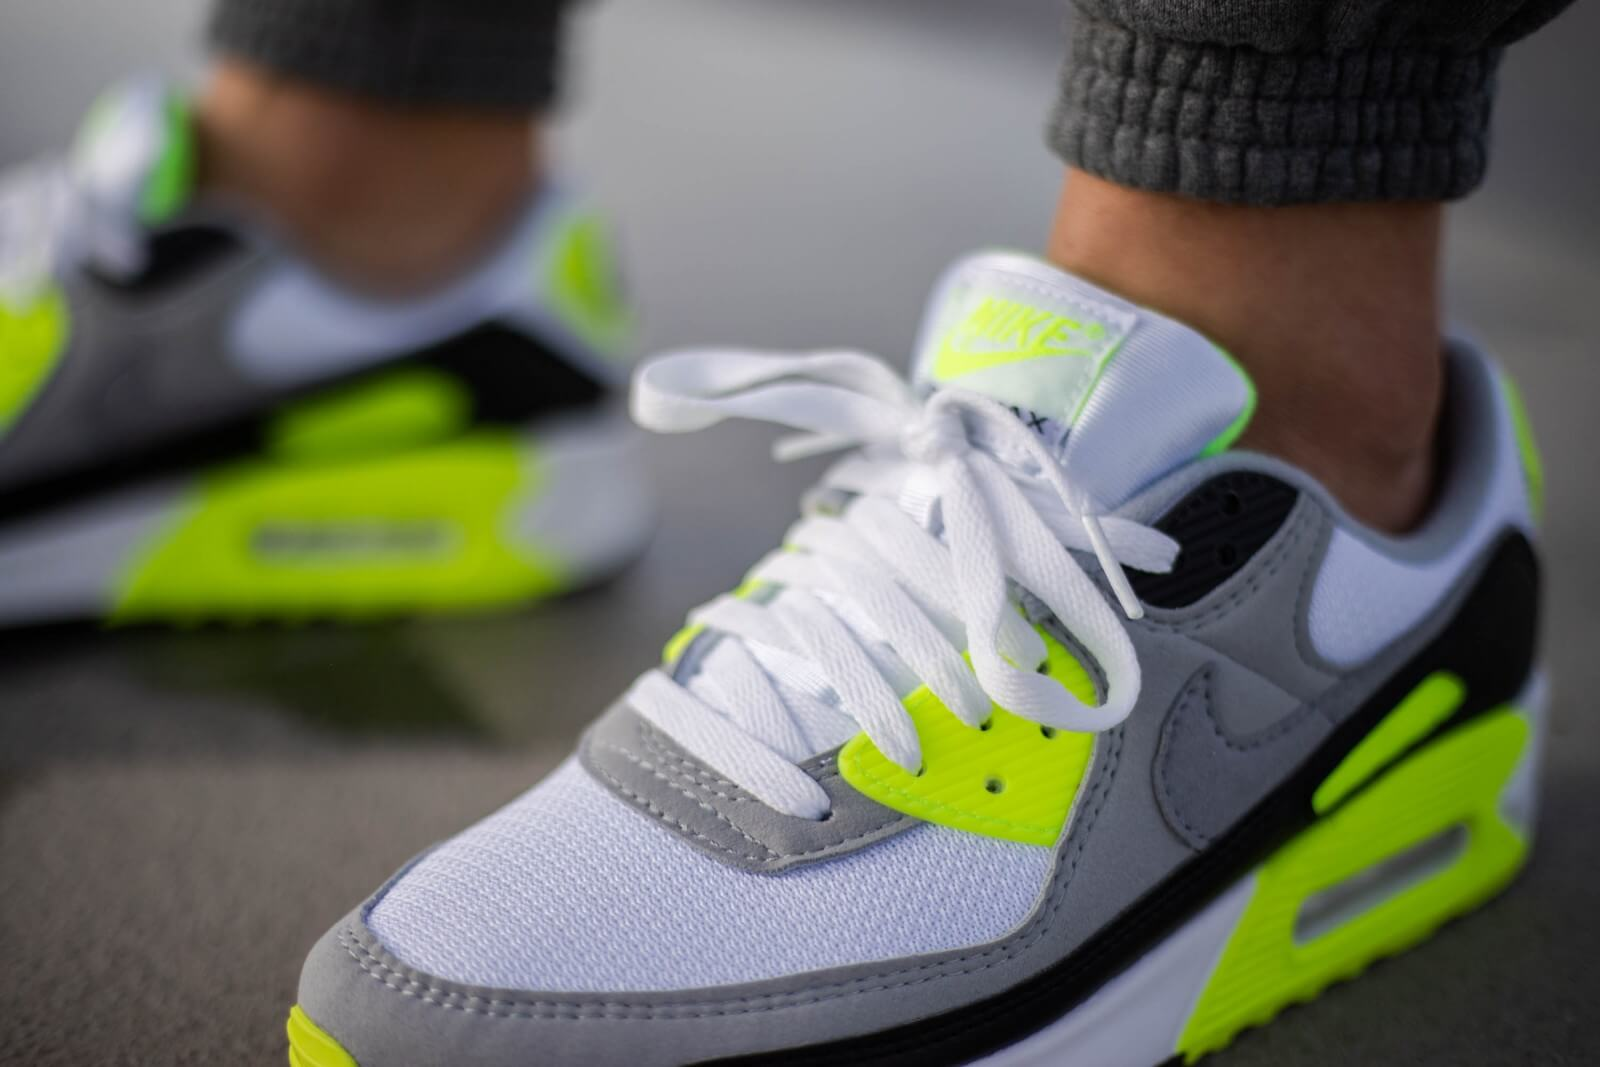 Nike Air Max 90 WhiteParticle Grey Volt CD0881 103